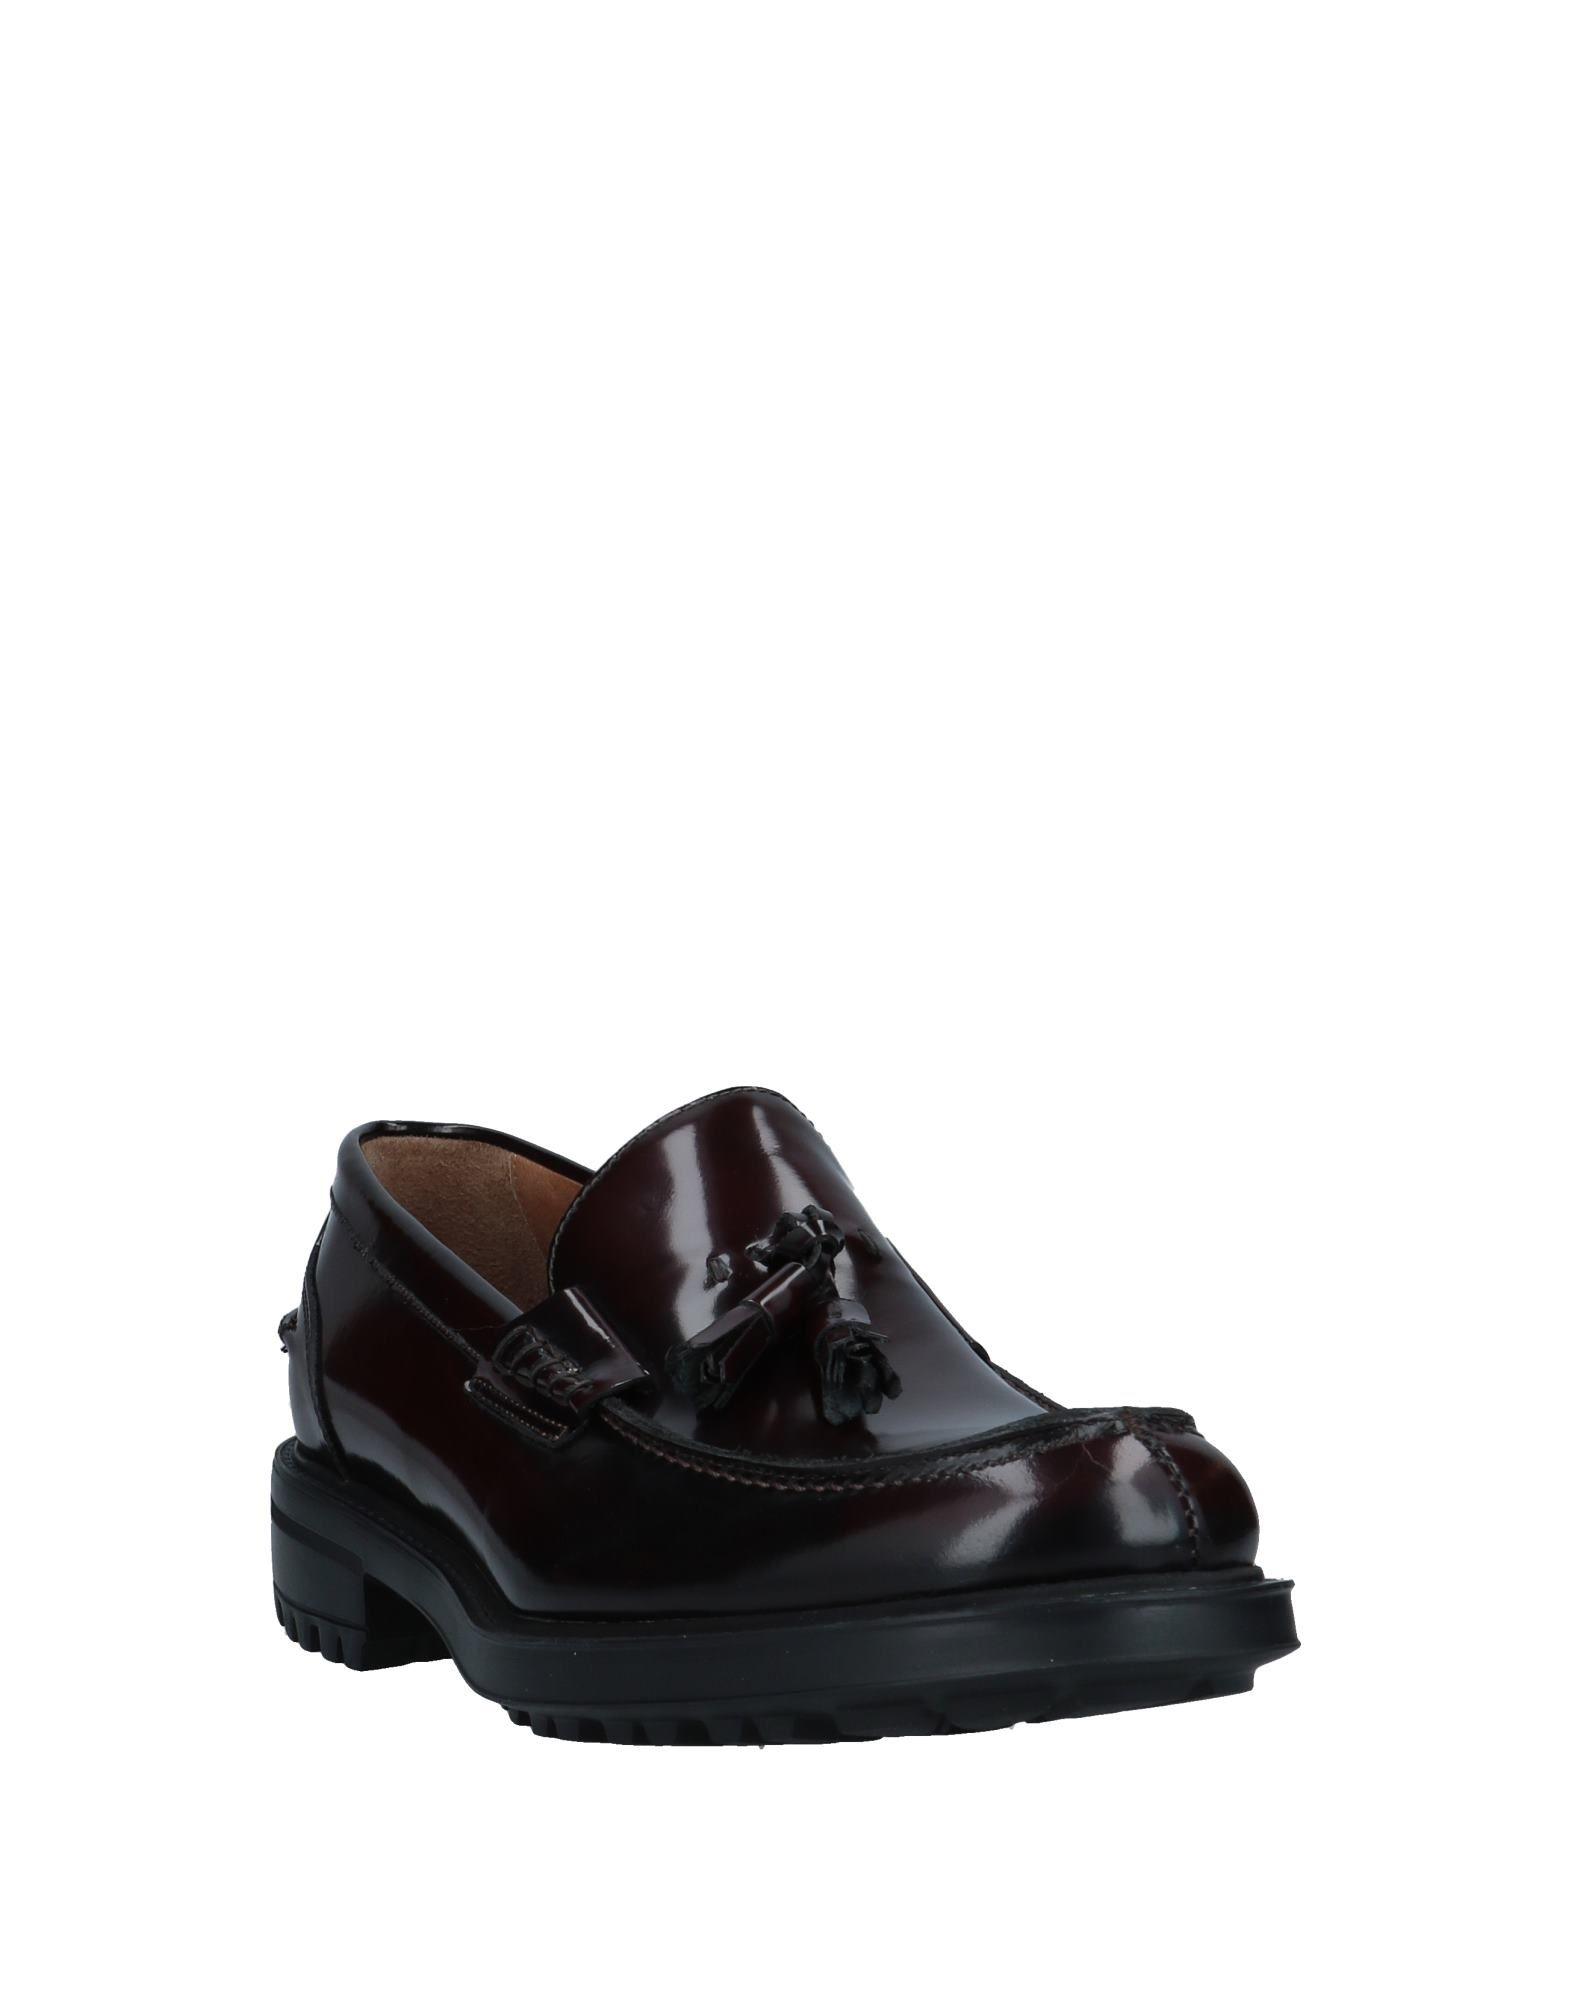 Baldinini Mokassins Herren Qualität  11554078NJ Gute Qualität Herren beliebte Schuhe 16ce0d